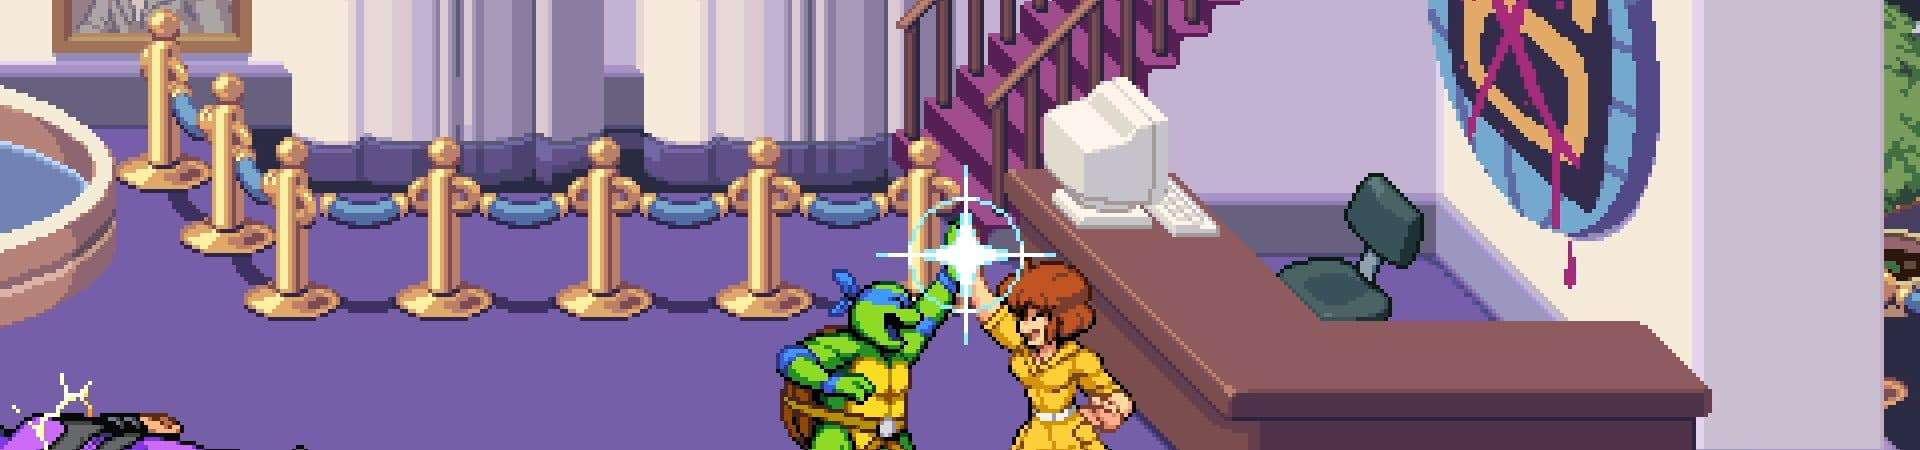 April O'Neil em 'Teenage Mutant Ninja Turtles: Shredder's Revenge'. Imagem: Dotemu/Divulgação